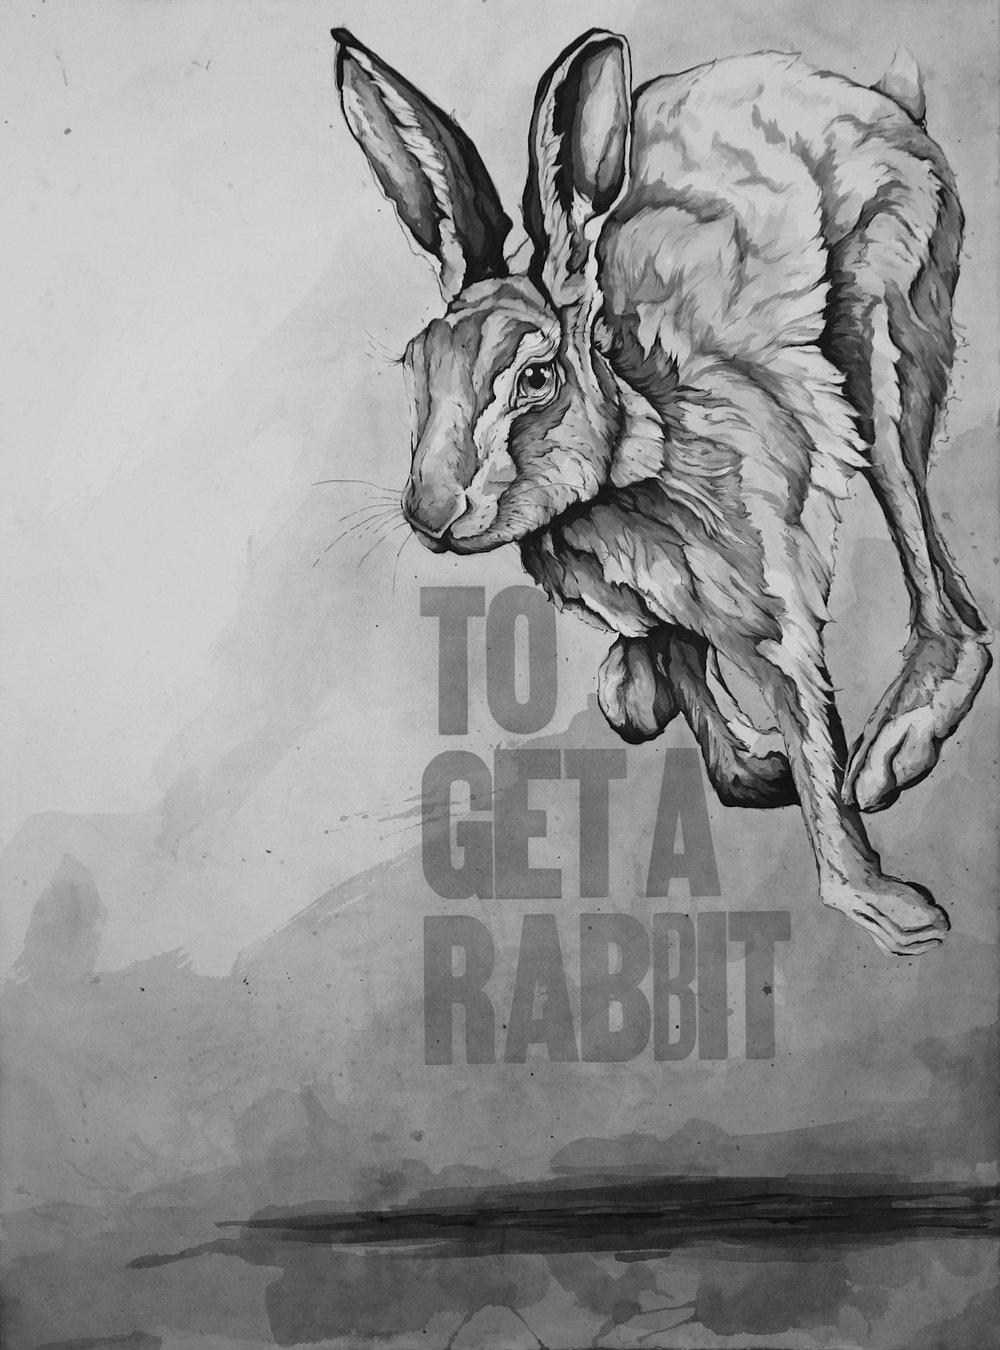 3To Get a Rabbit.JPG